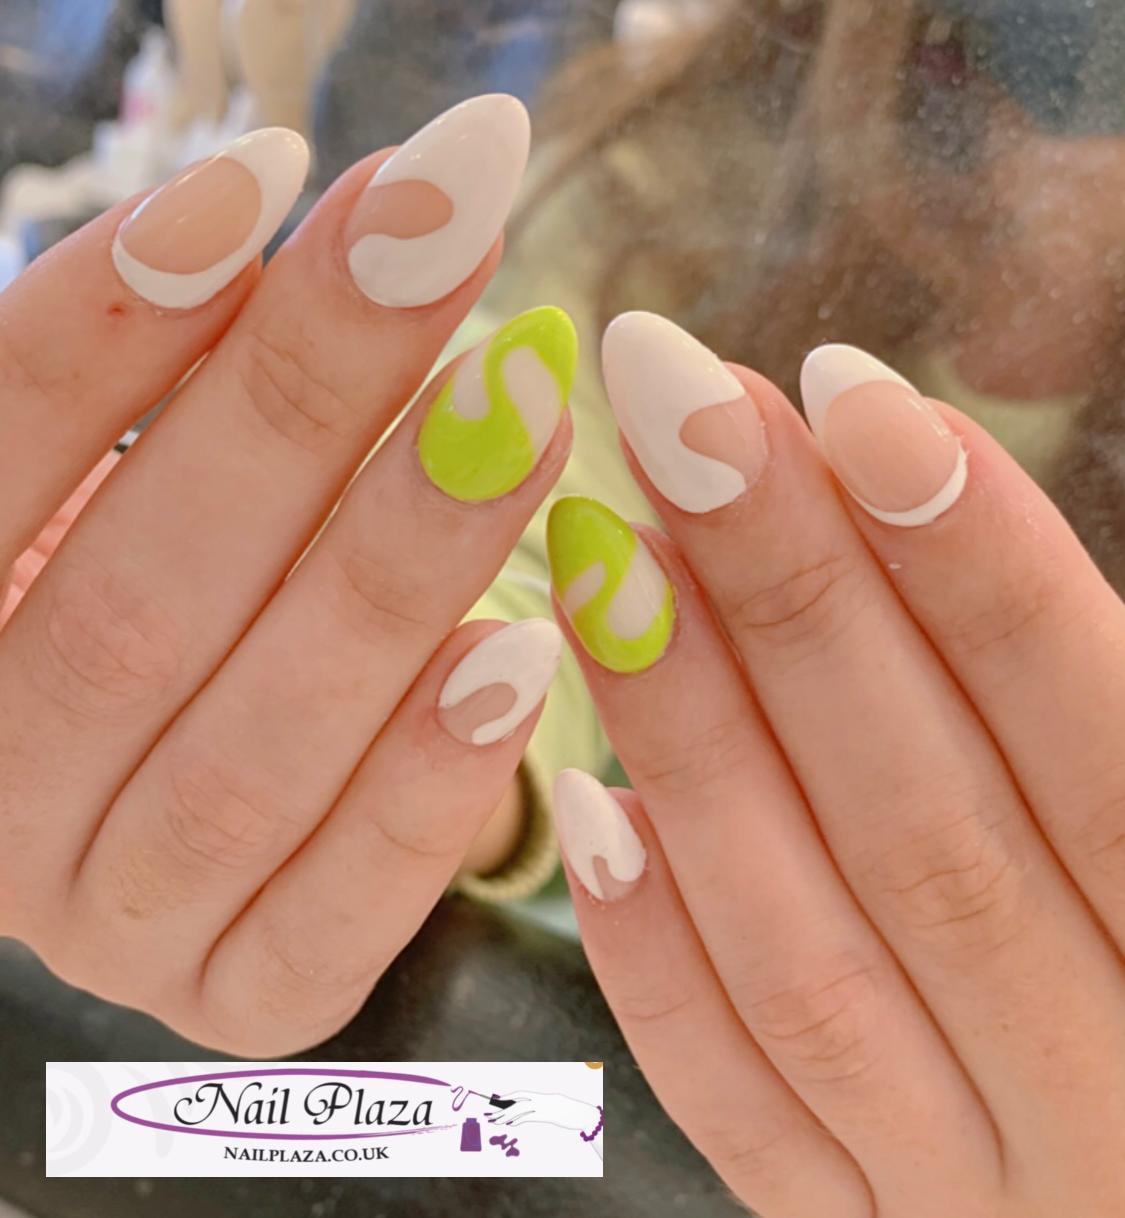 nail-plaza-twickenham-080521-2